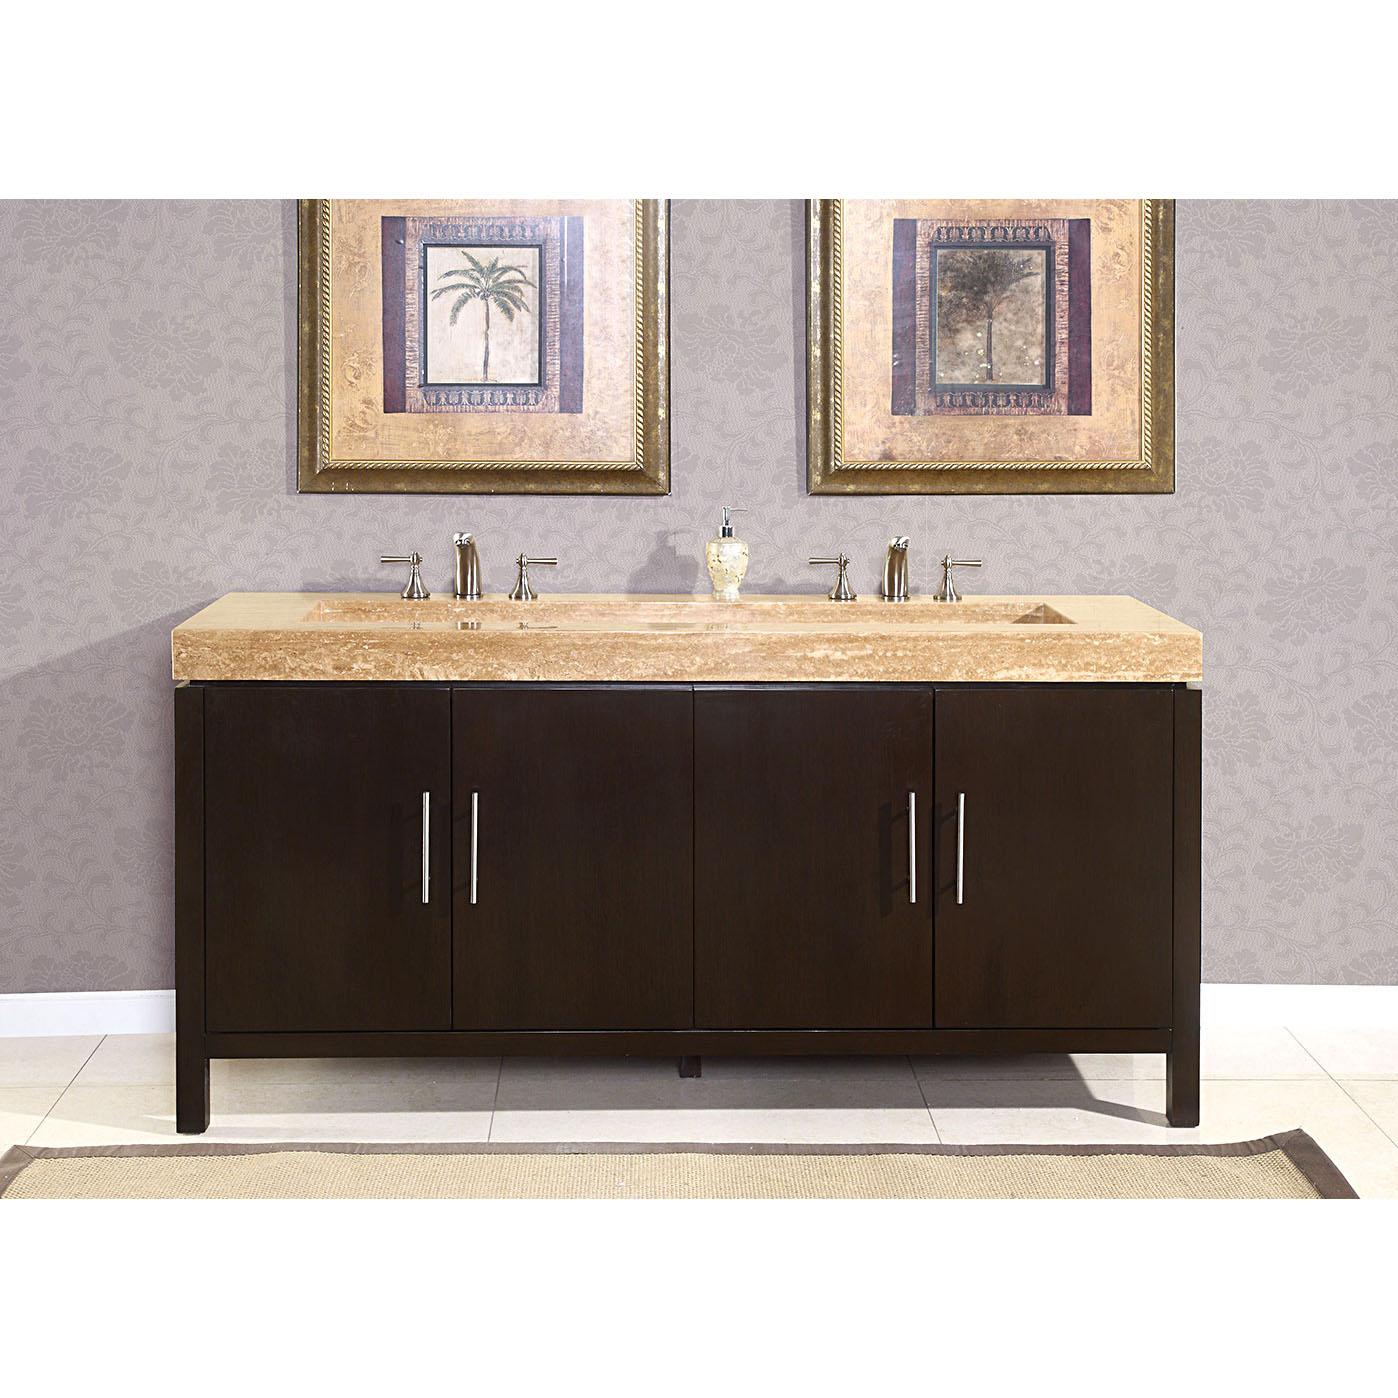 72-inch Modern Travertine Stone Top Integrated Sink Bathroom Double Vanity Cabinet